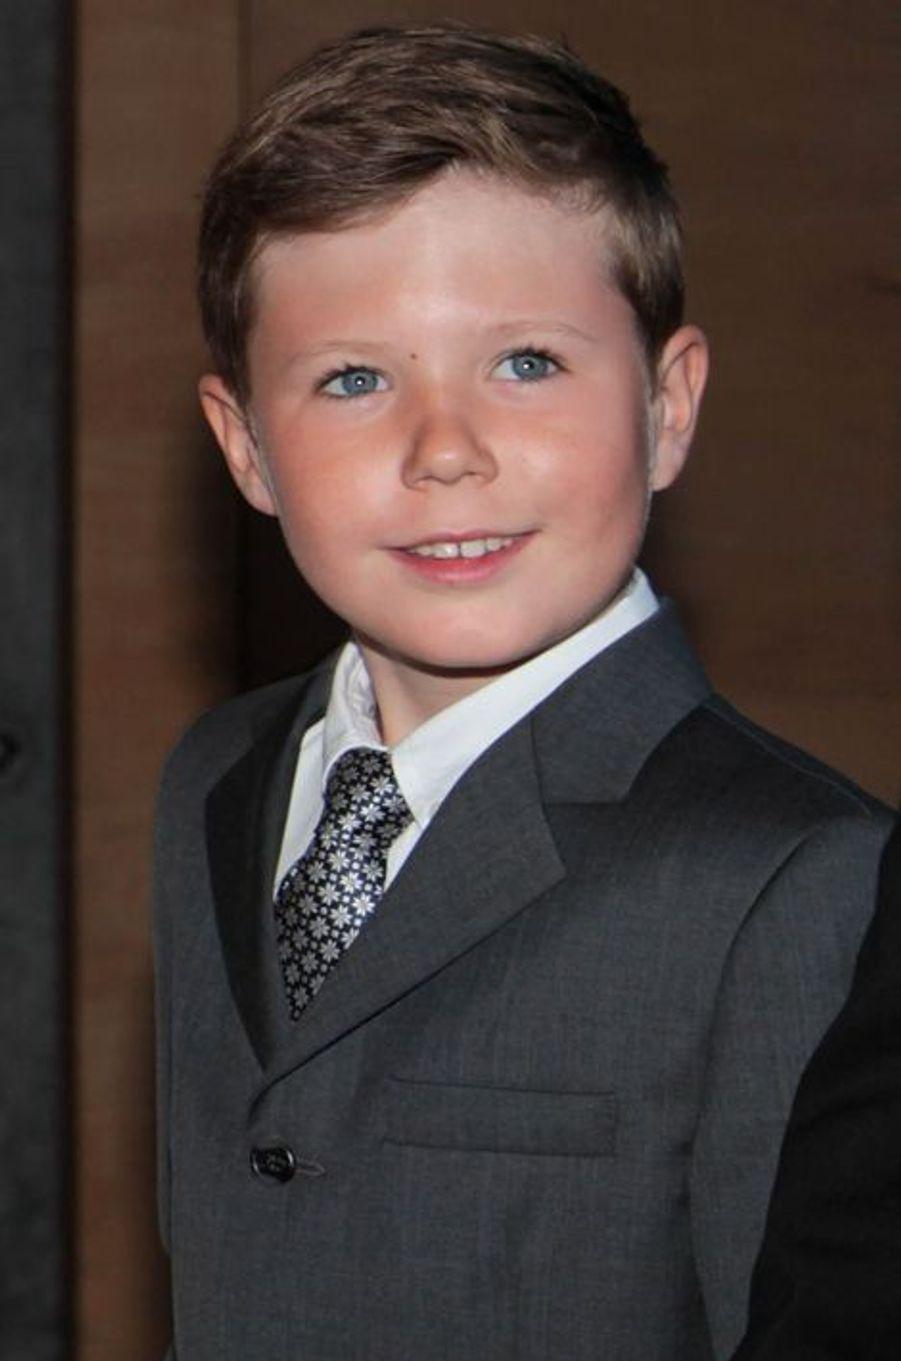 Le prince Christian de Danemark le 1er juin 2014